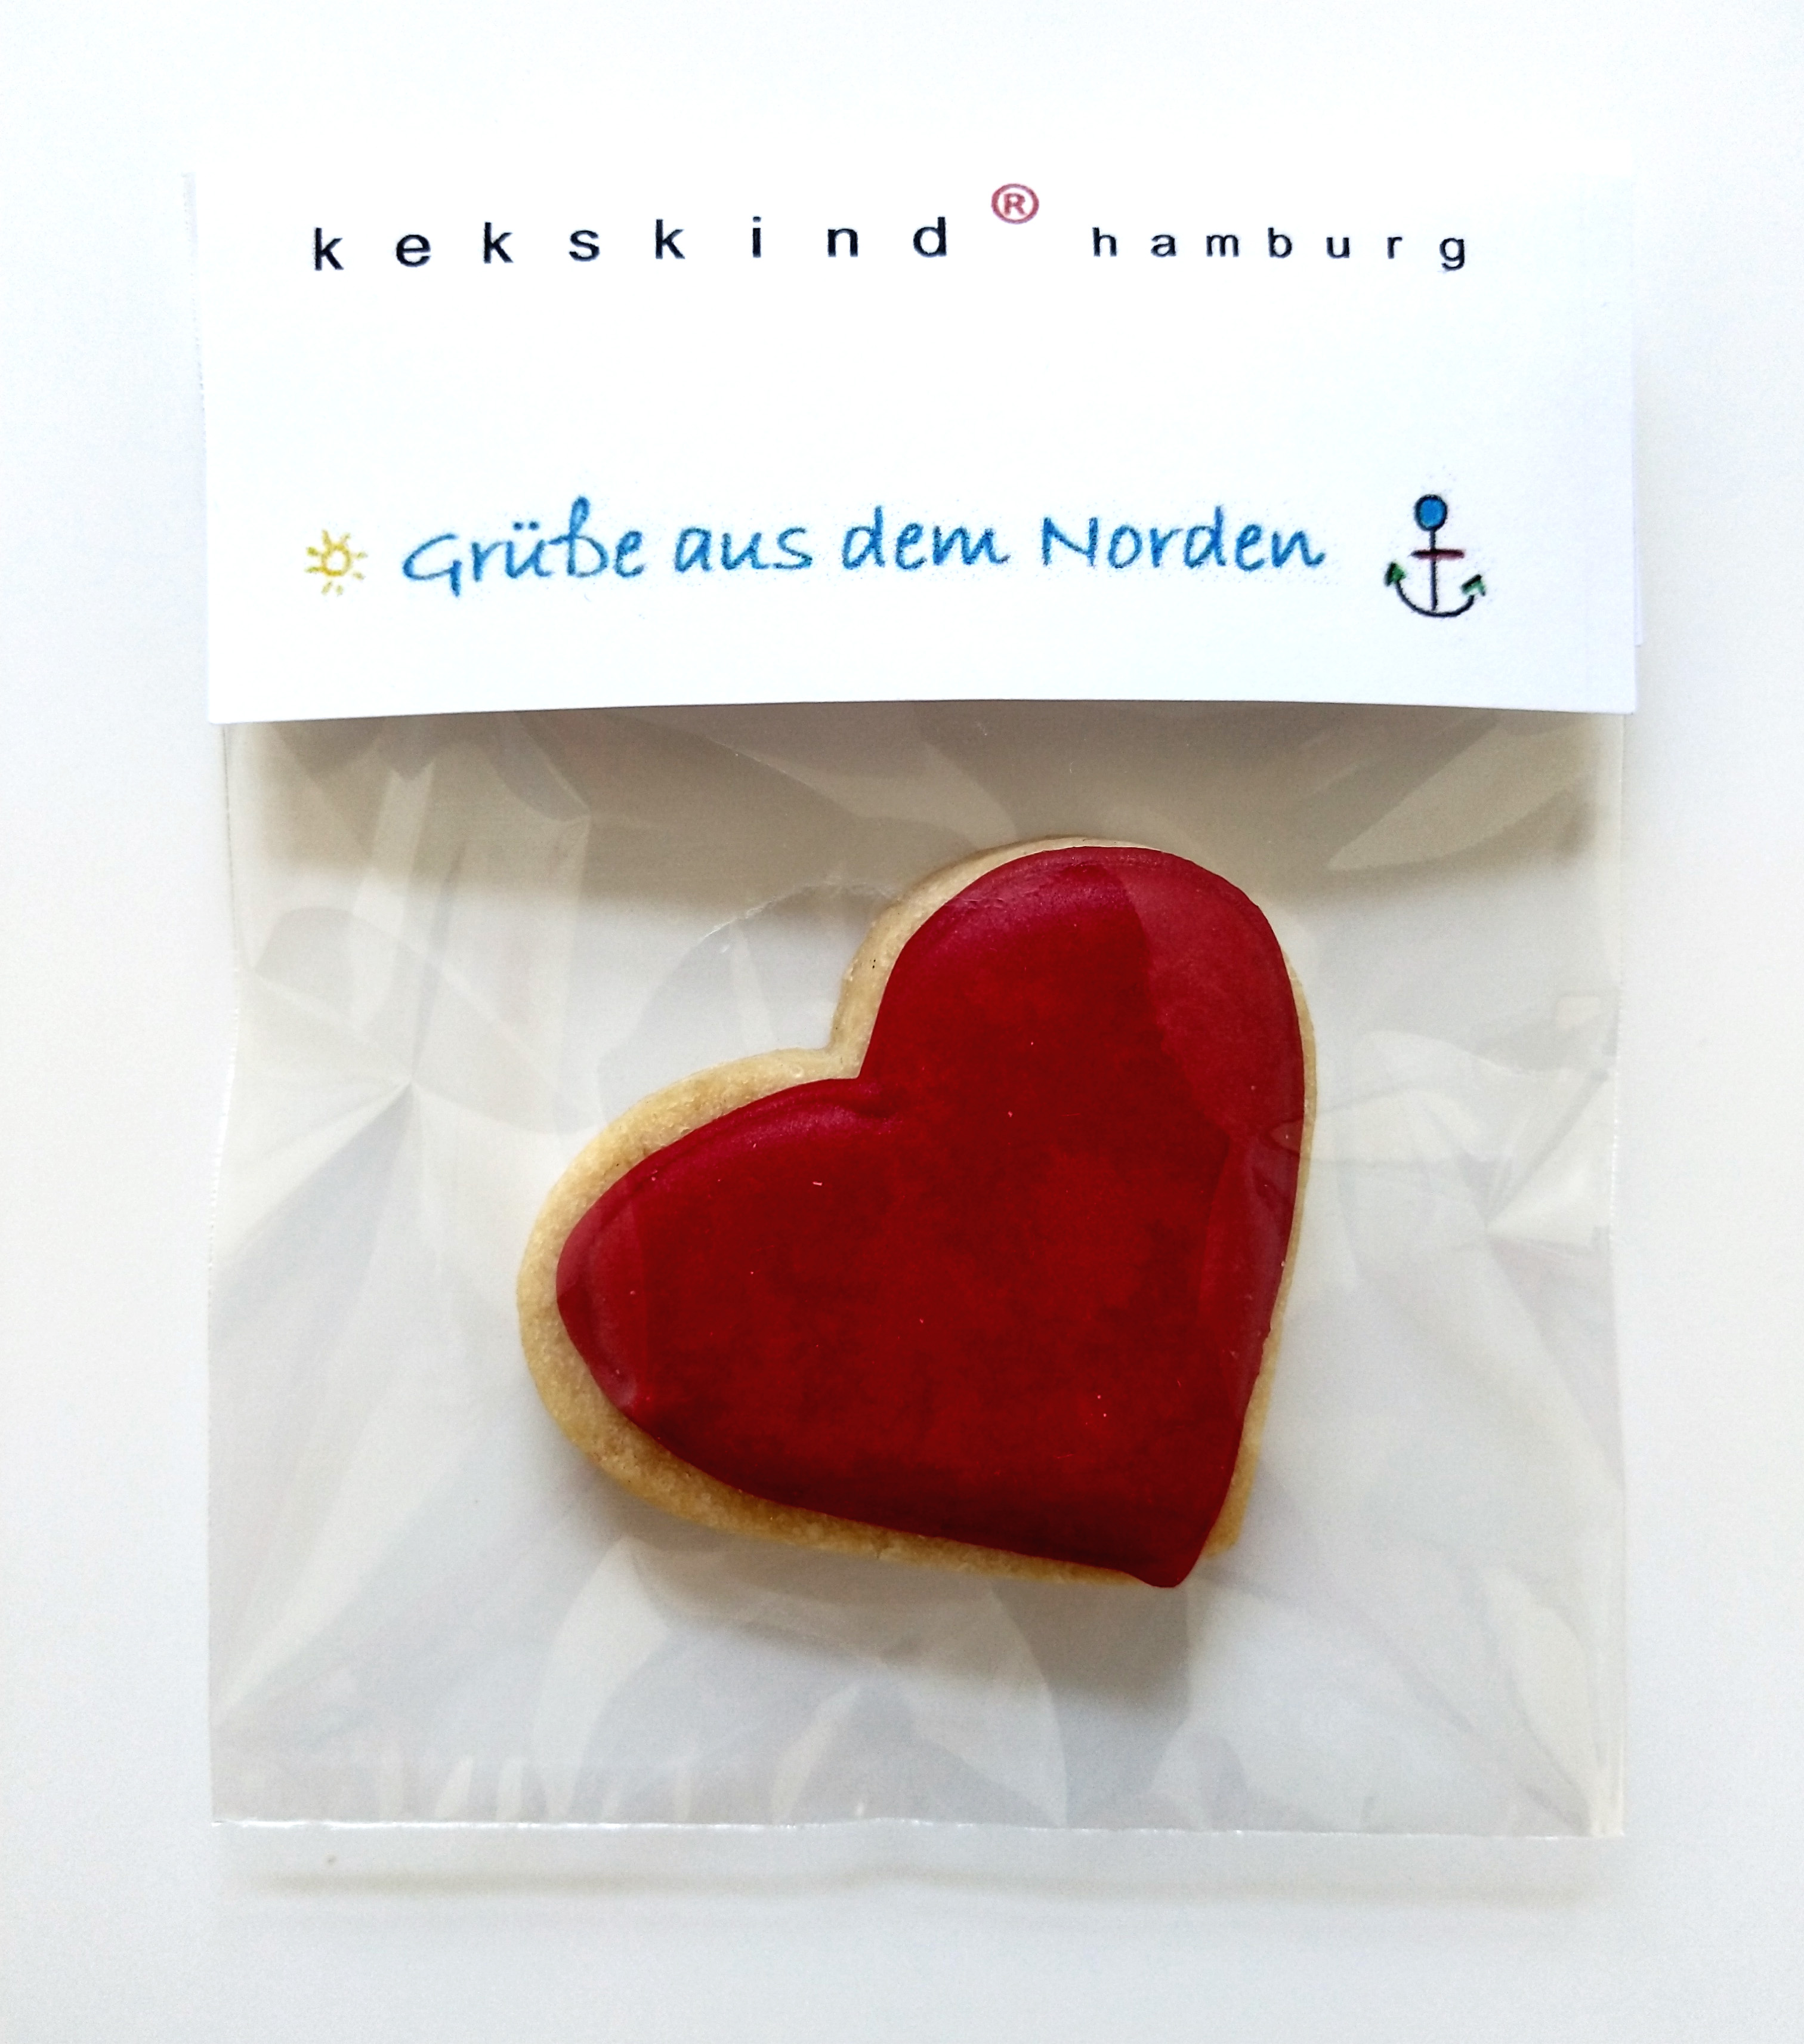 bedruckbare Banderole für Keksverpackung